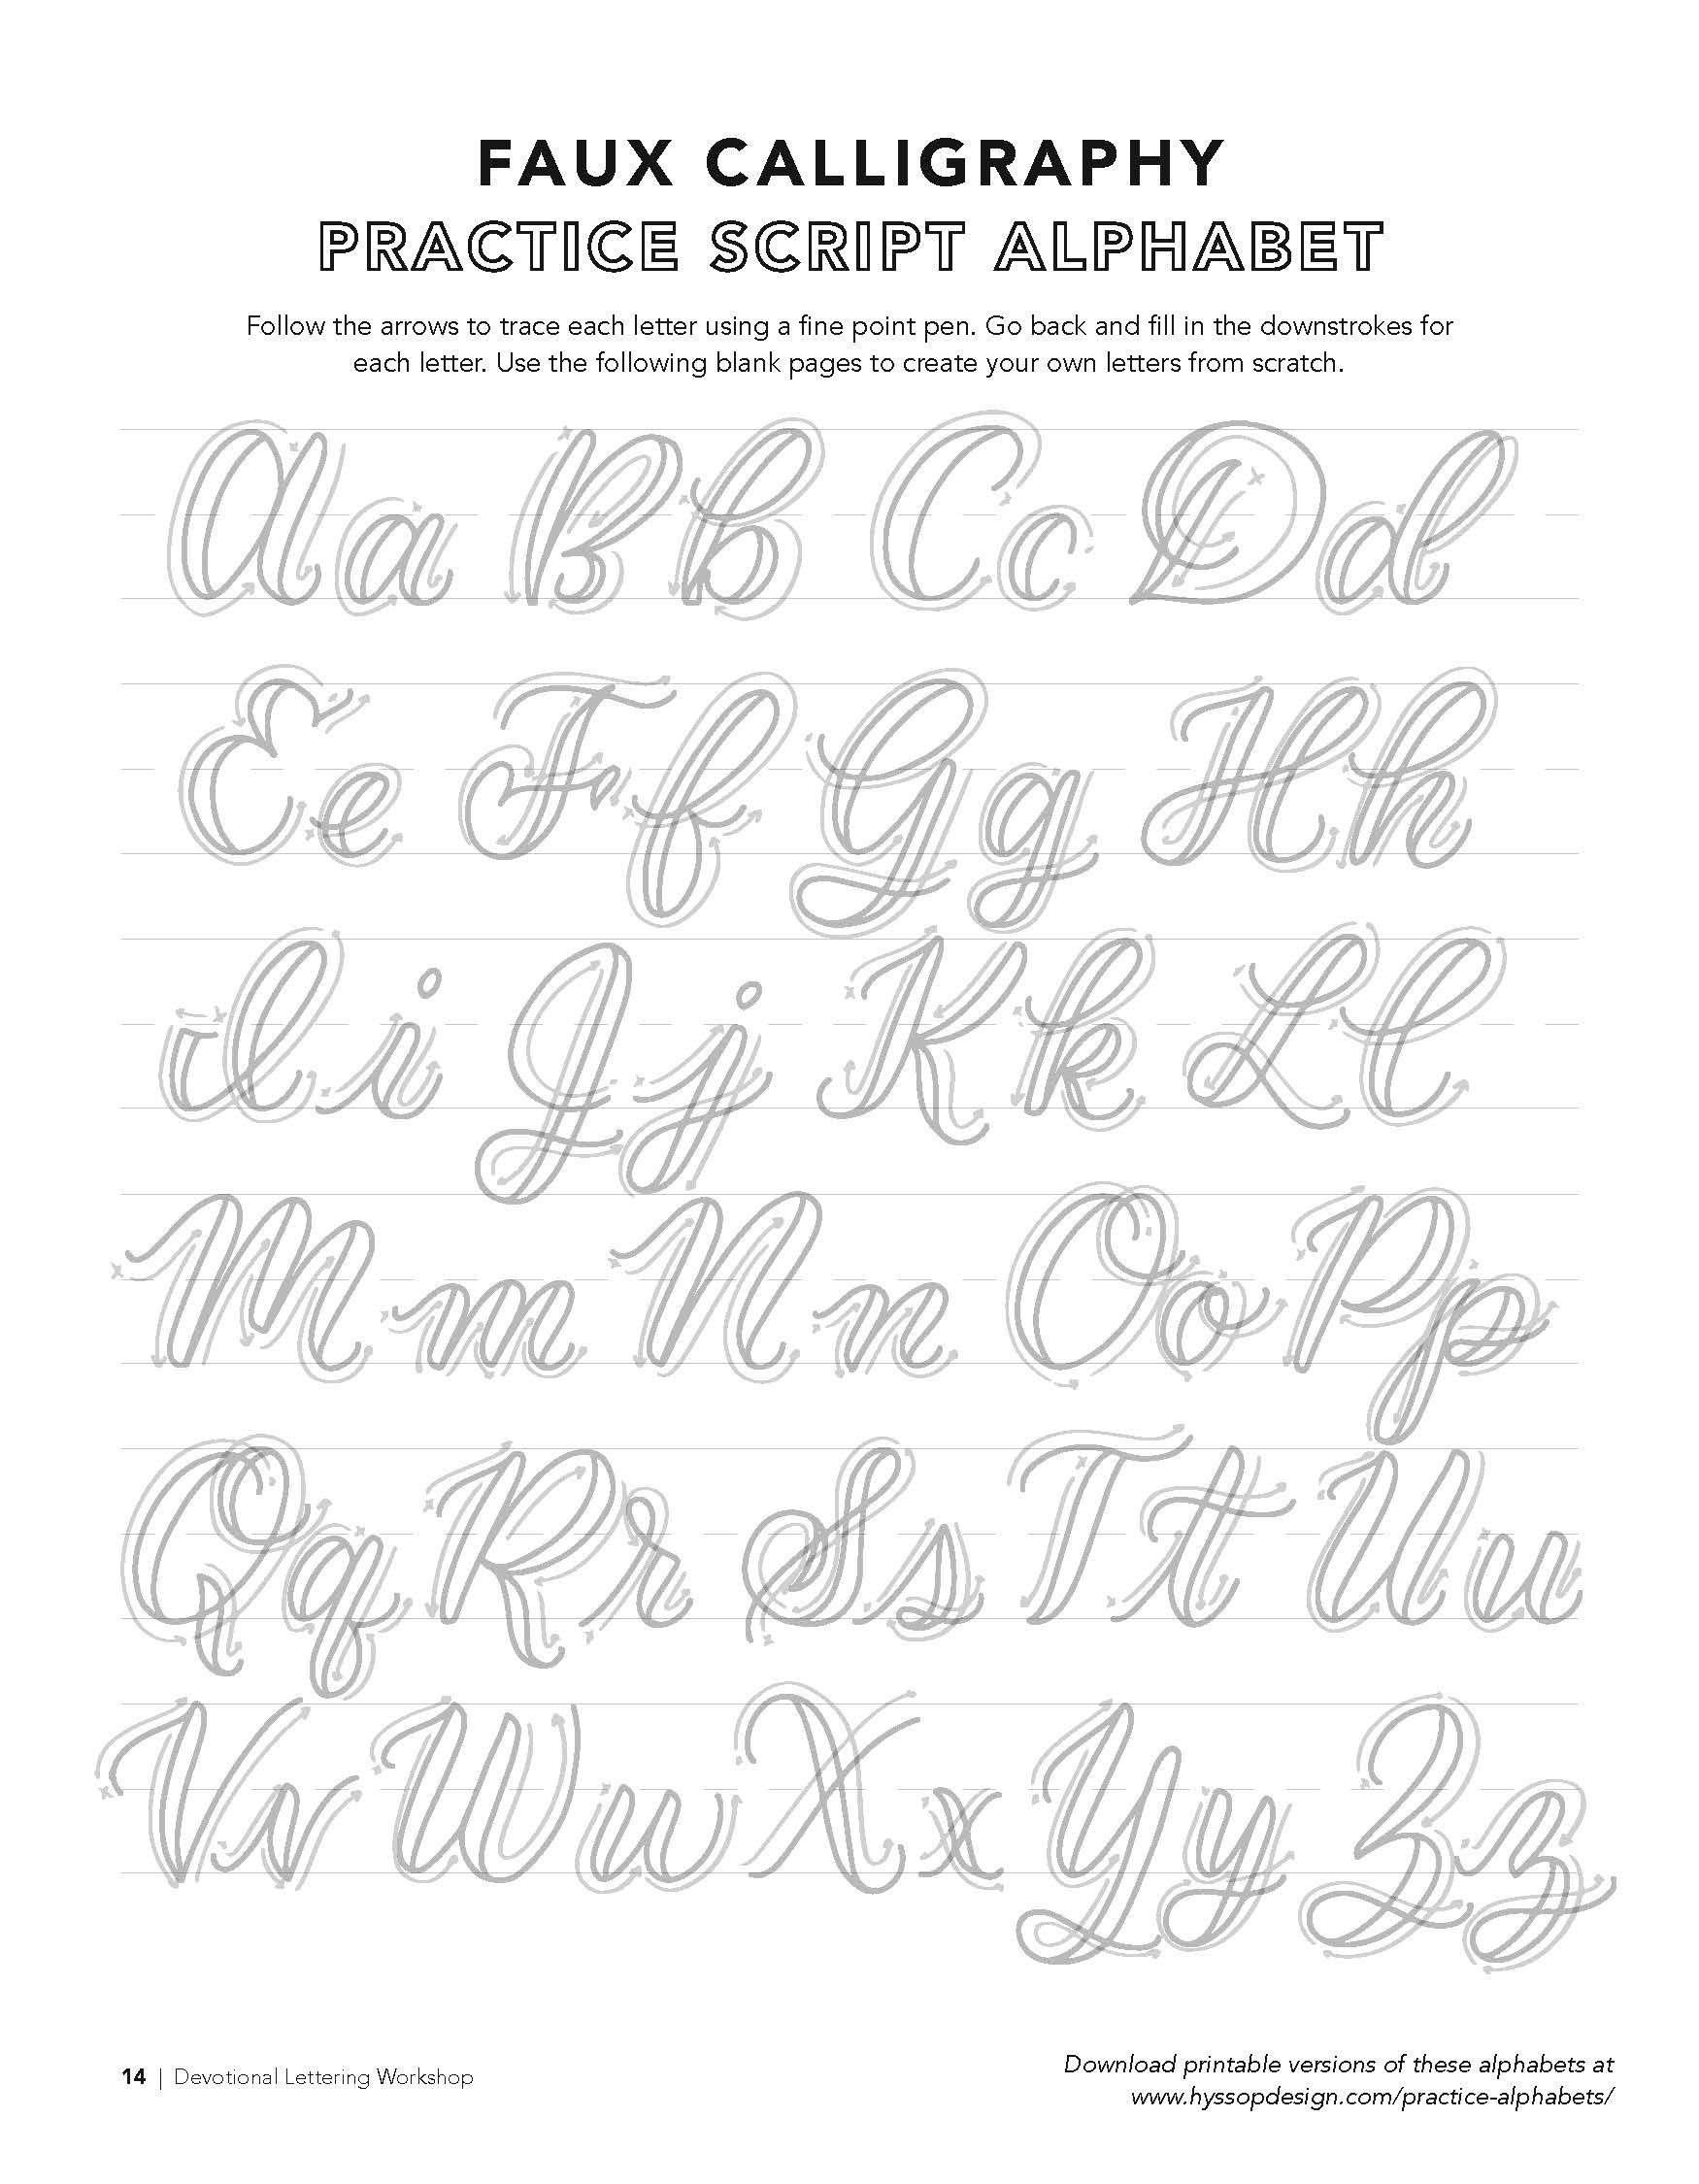 Free Calligraphy Alphabets Jacy Corral Hand Lettering Alphabet Hand Lettering Worksheet Lettering Alphabet Fonts